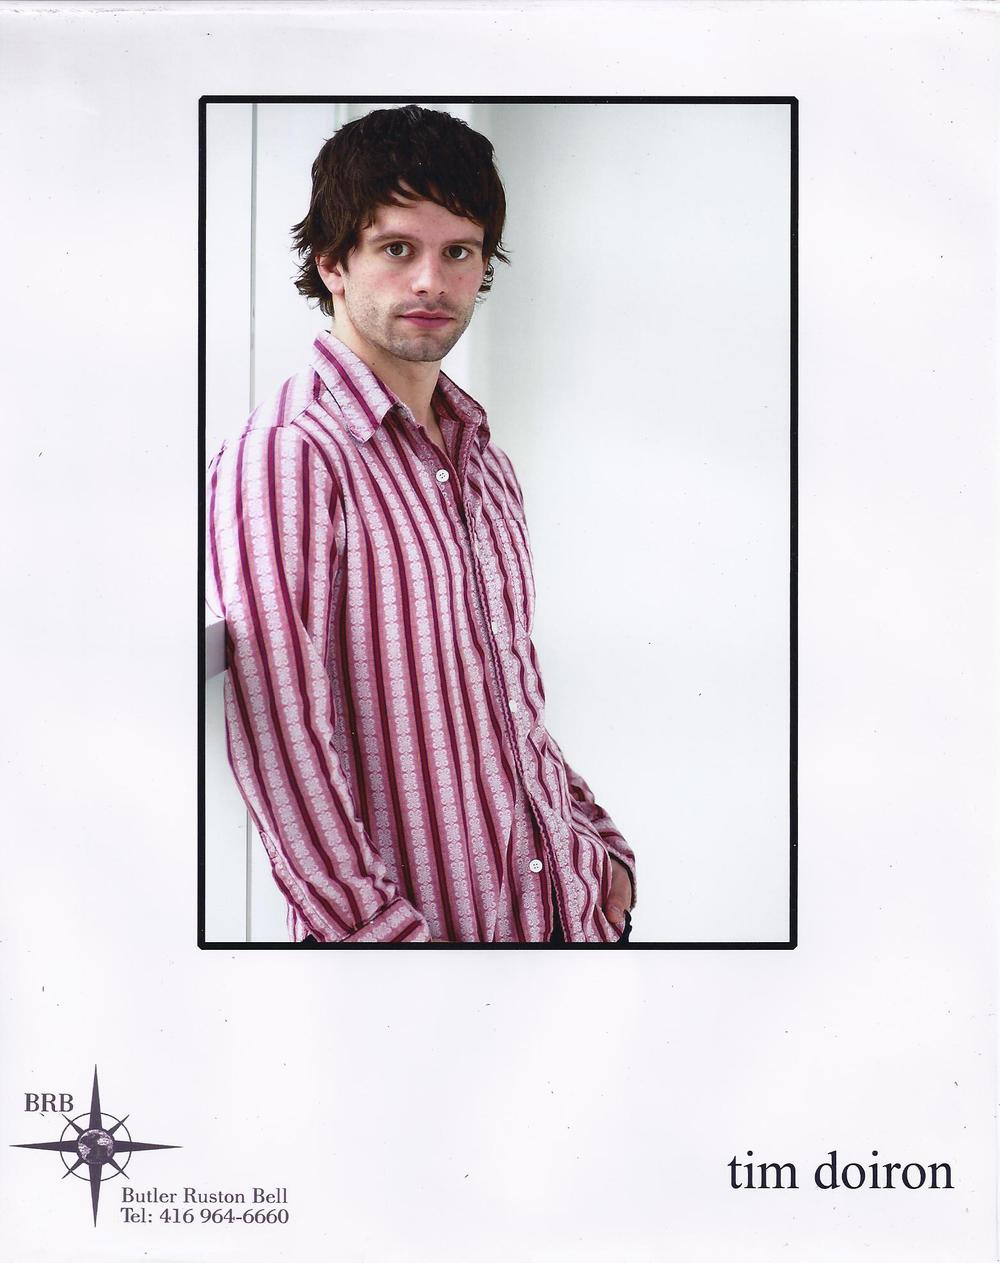 Tim Dorian